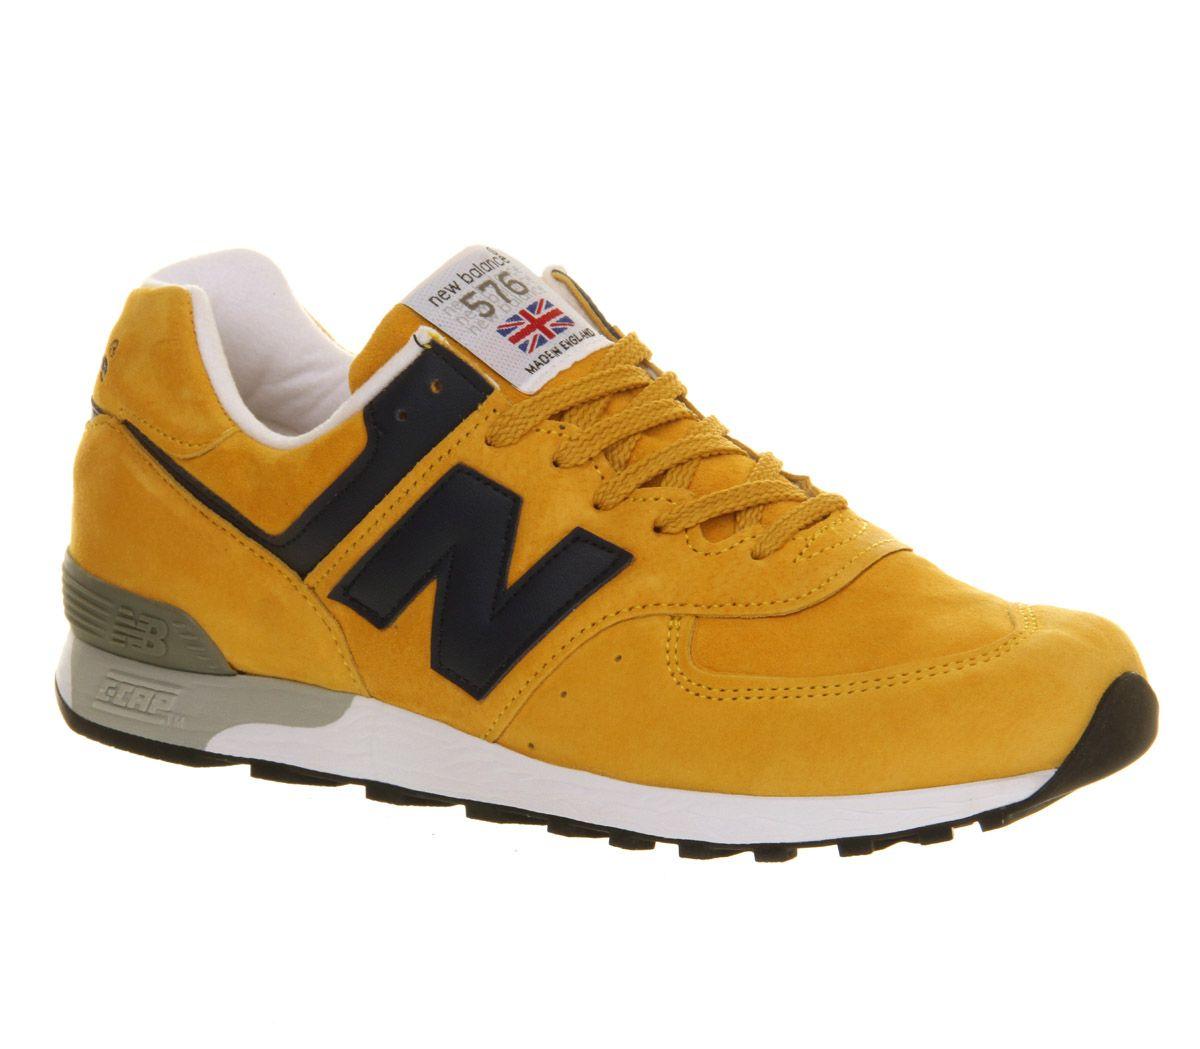 new balance made in england mustard yellow - (MUSTARD NAVY)